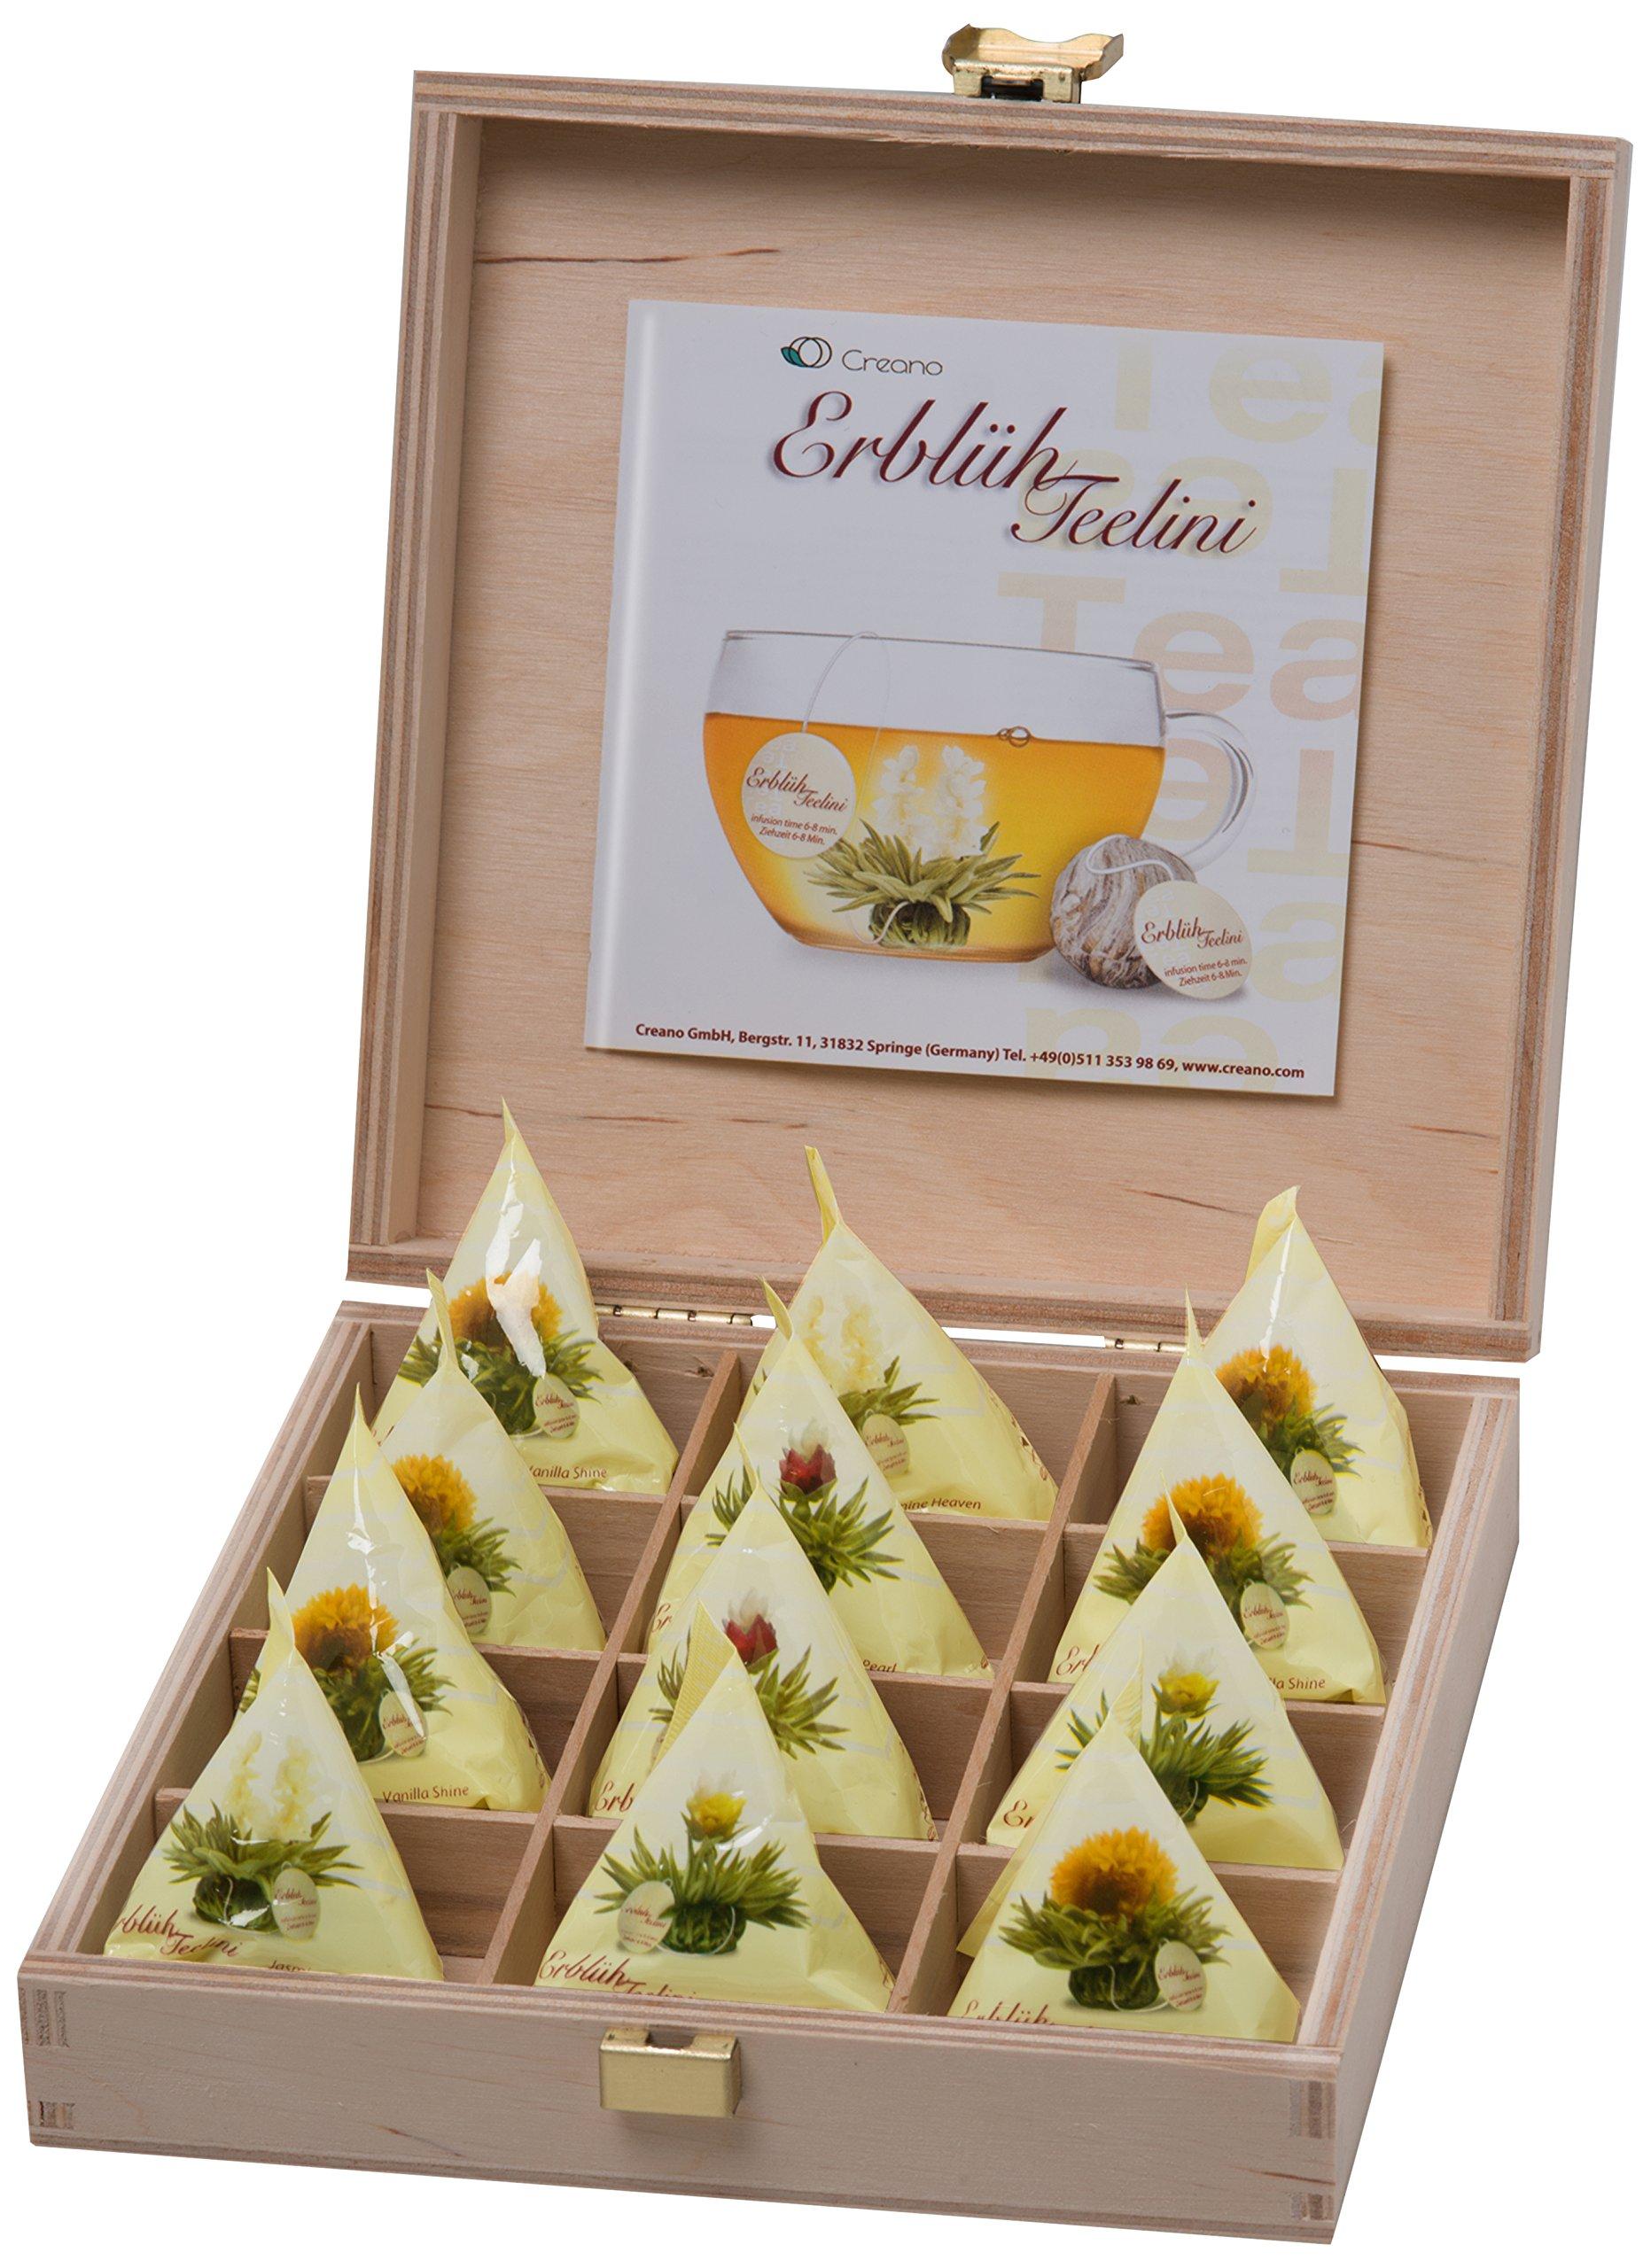 Creano-Teelini-Teeblumen-im-Tassenformat-Geschenkset-in-Teekiste-aus-Holz-12-ErblhTeelini-in-4-Sorten-Weier-Tee